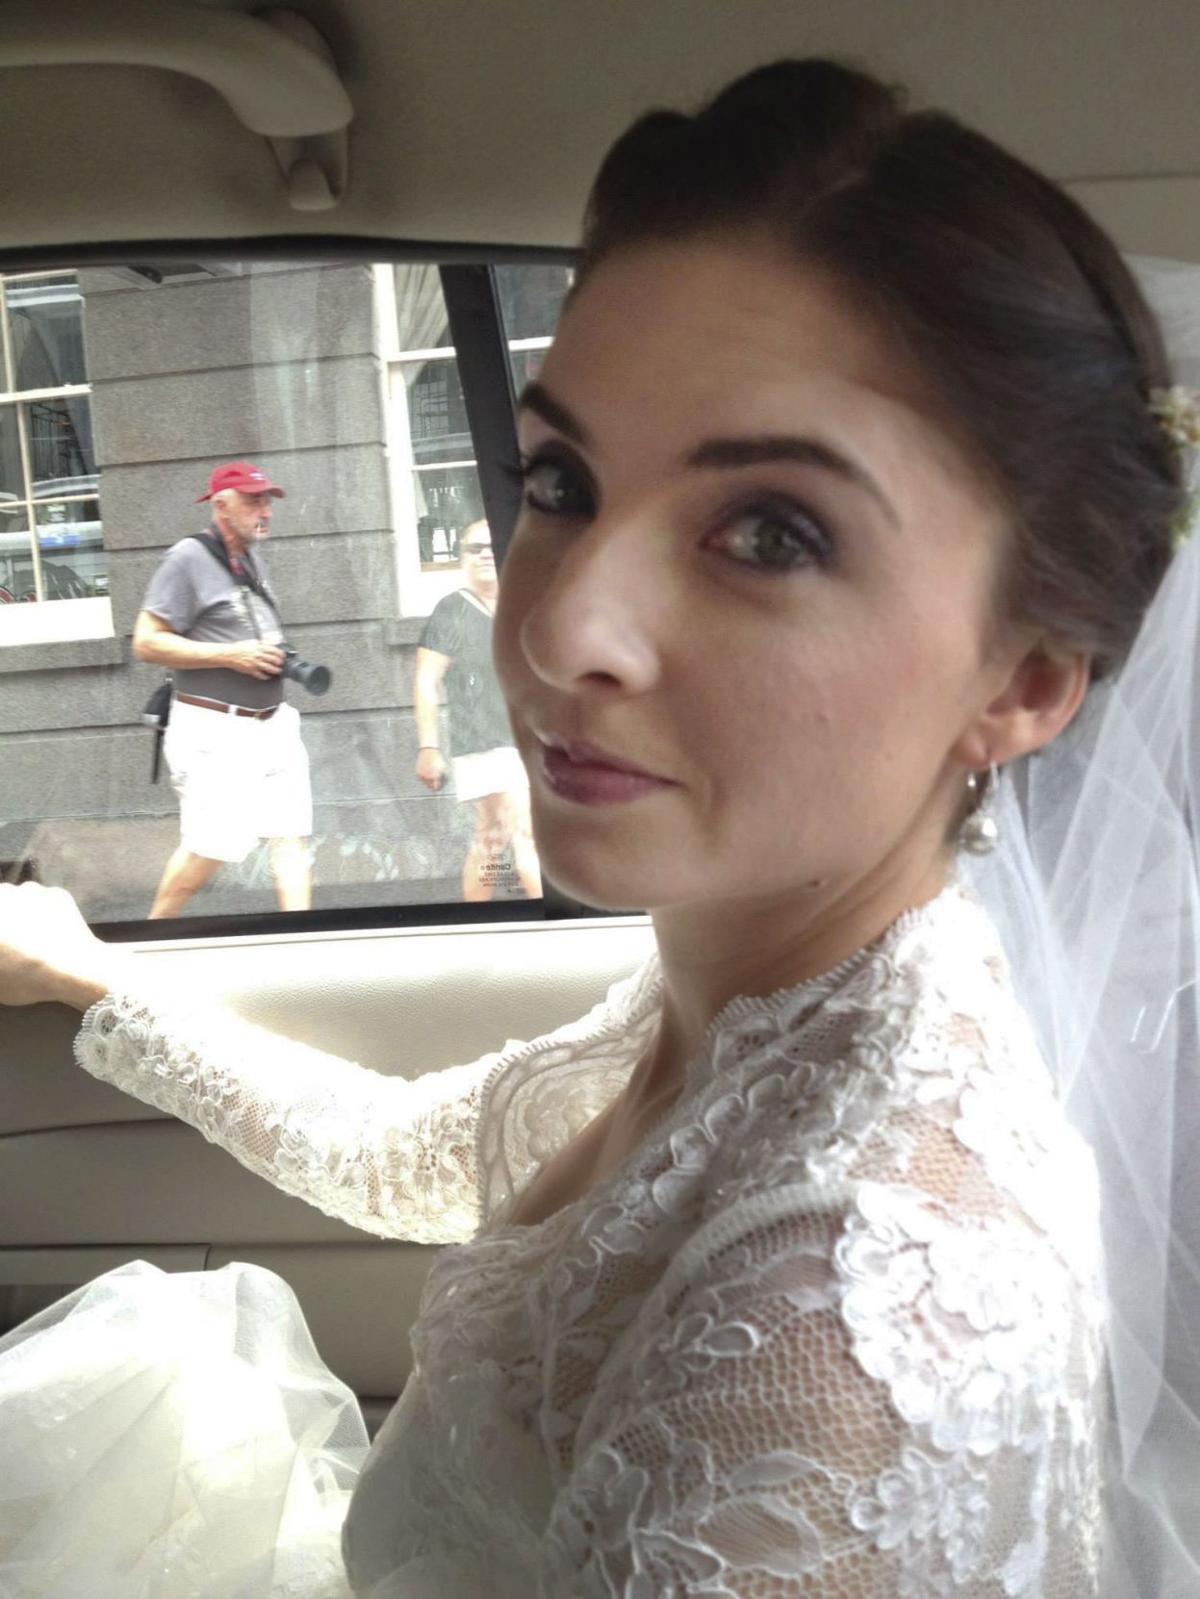 Wedding insurance expands as nuptials get pricier